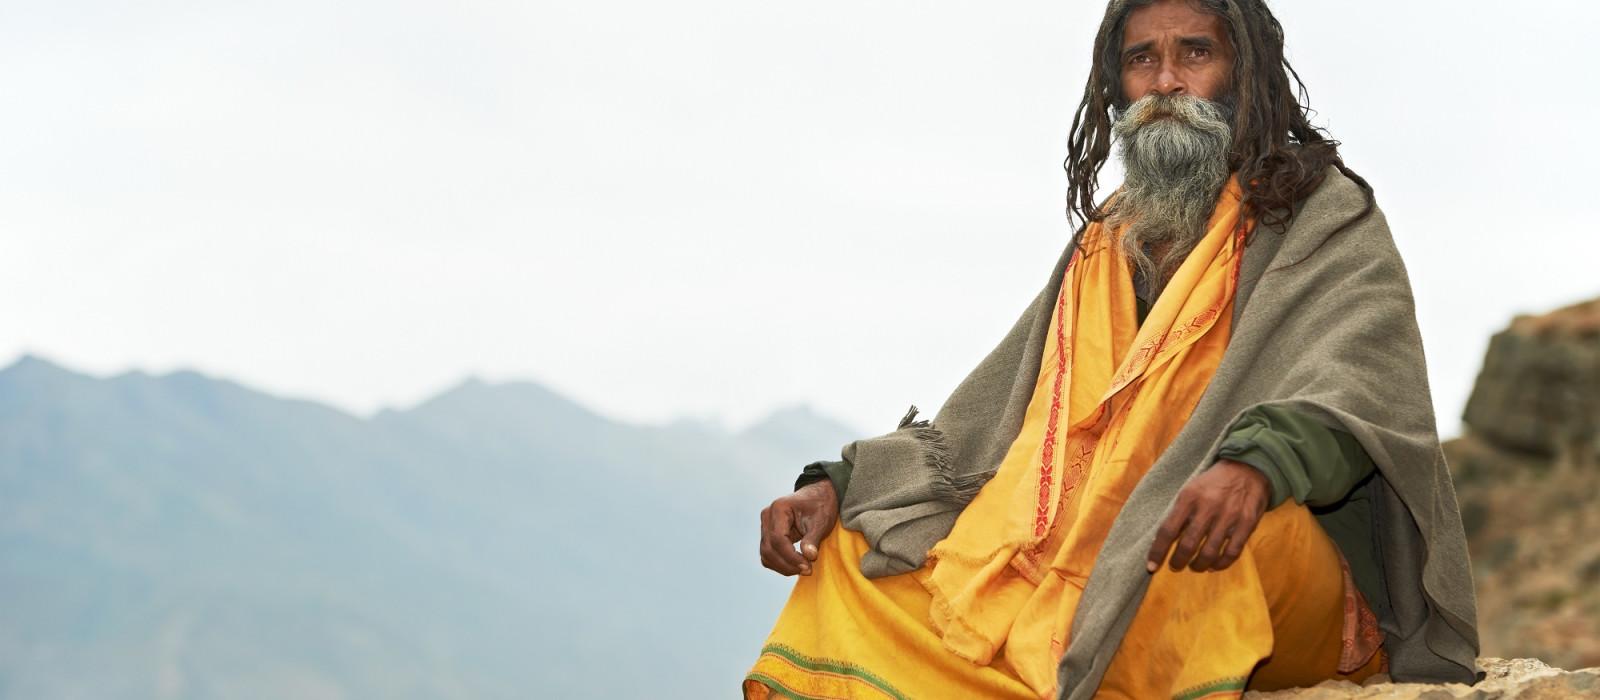 Sprituelles Nordindien: Götter, Ganges & Goldener Tempel Urlaub 1